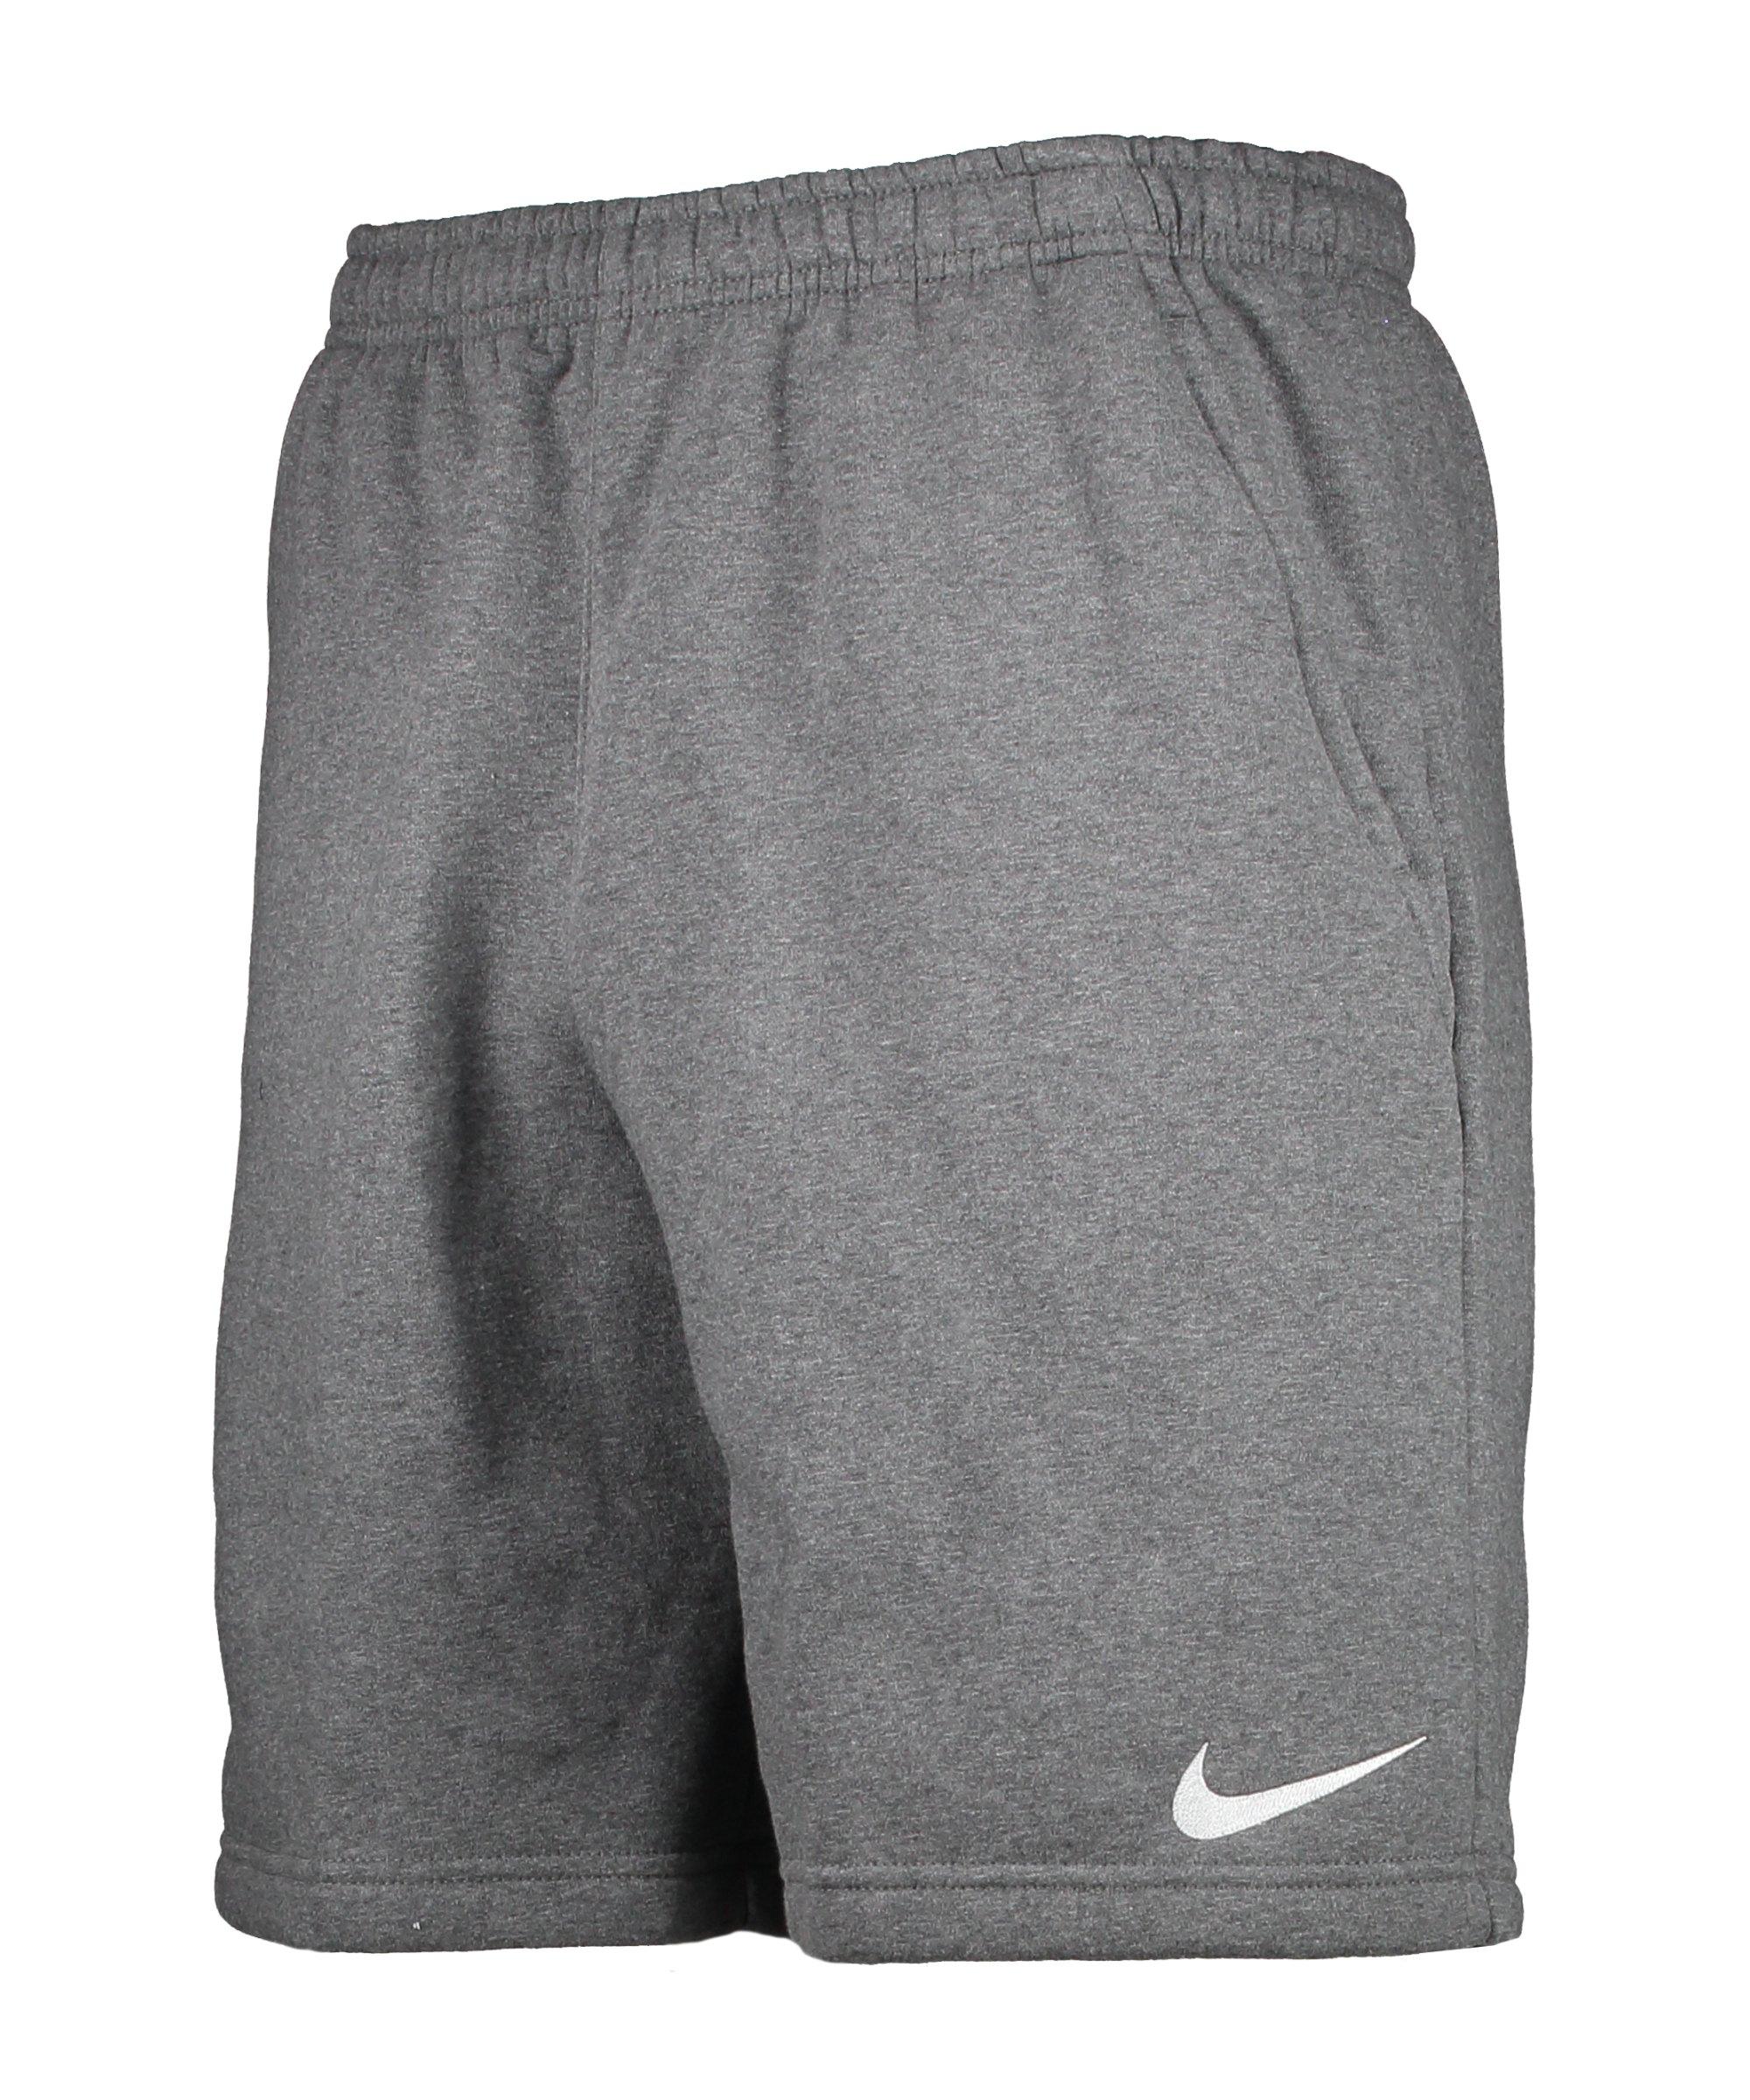 Nike Park 20 Fleece Short Grau Weiss F071 - grau